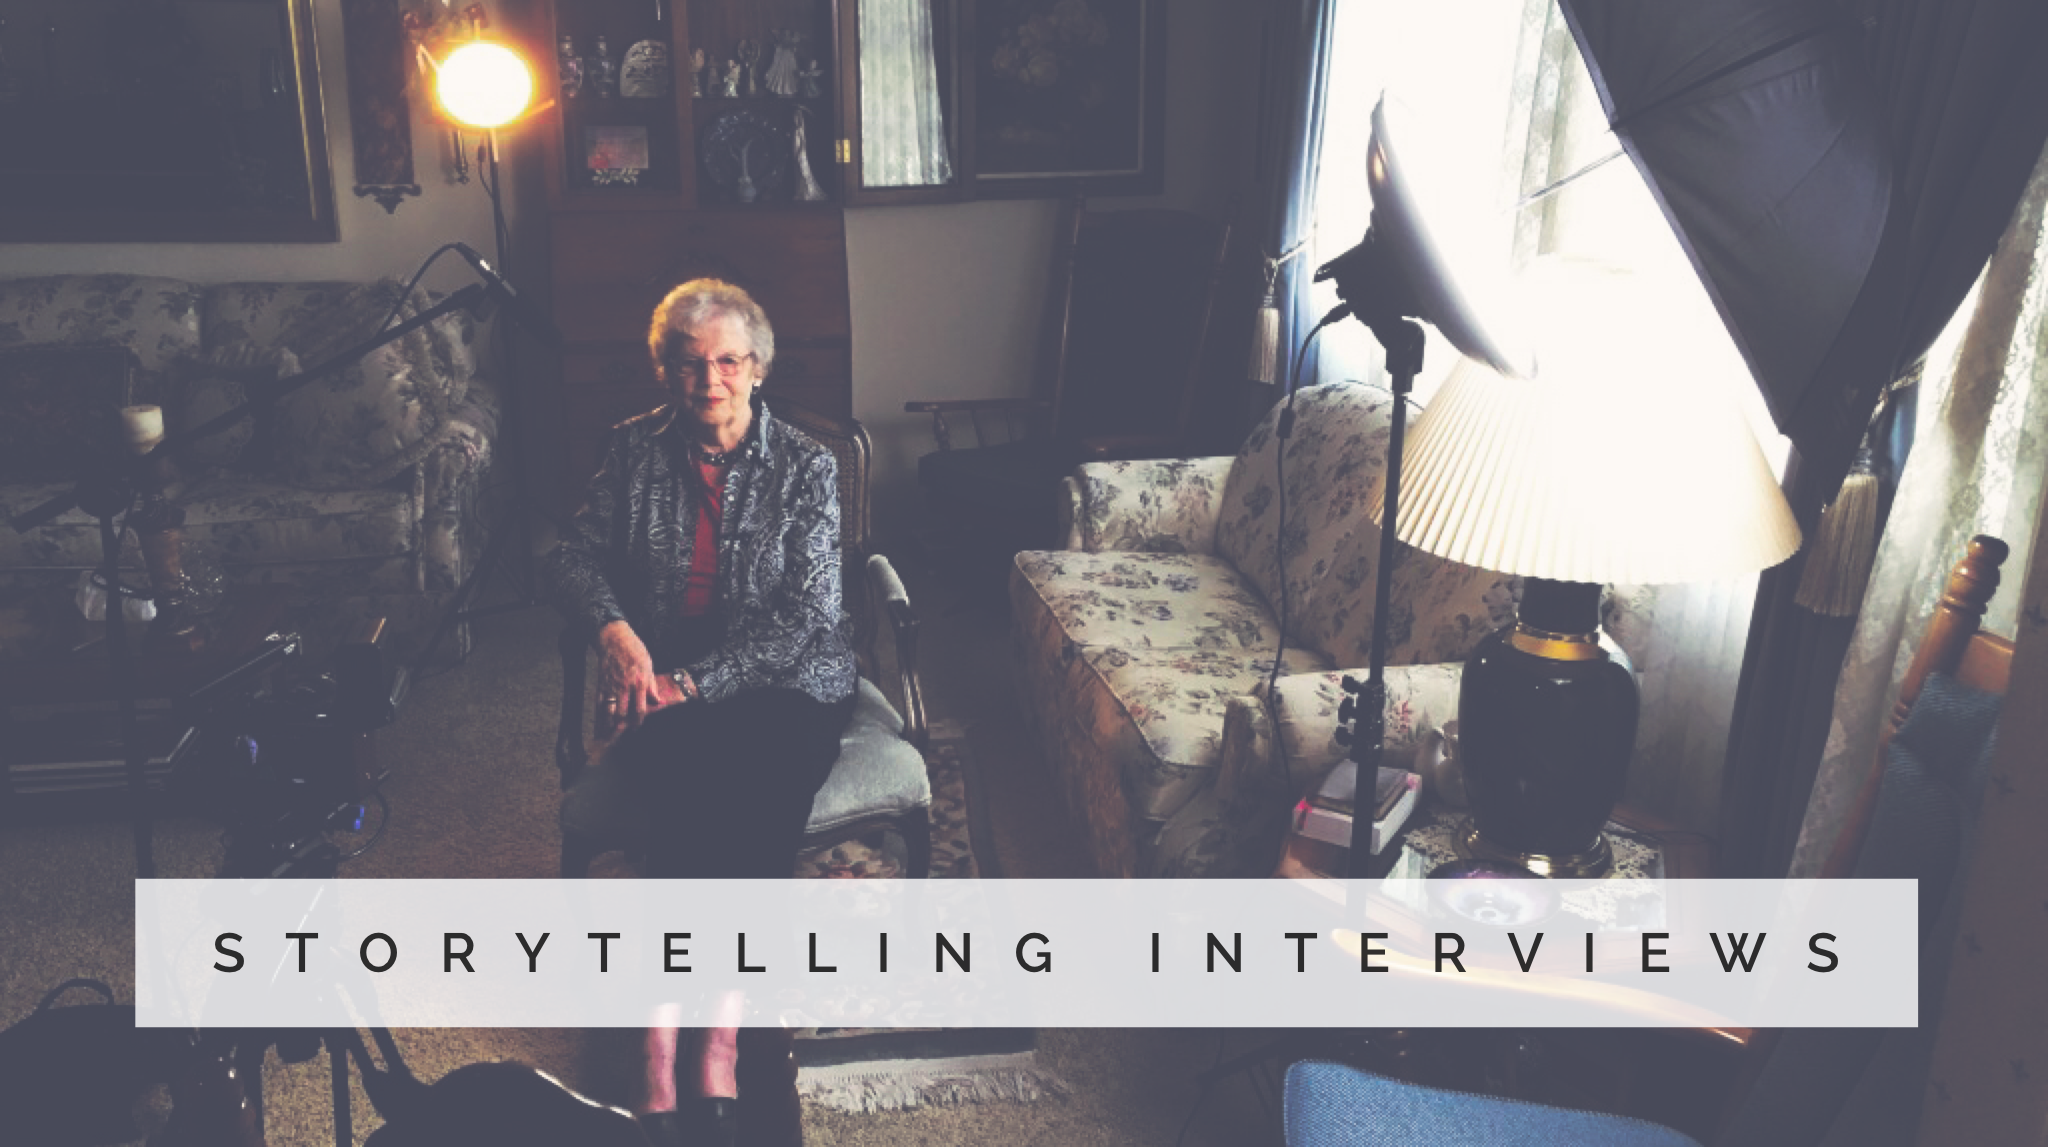 Grandma storytelling interview.PNG